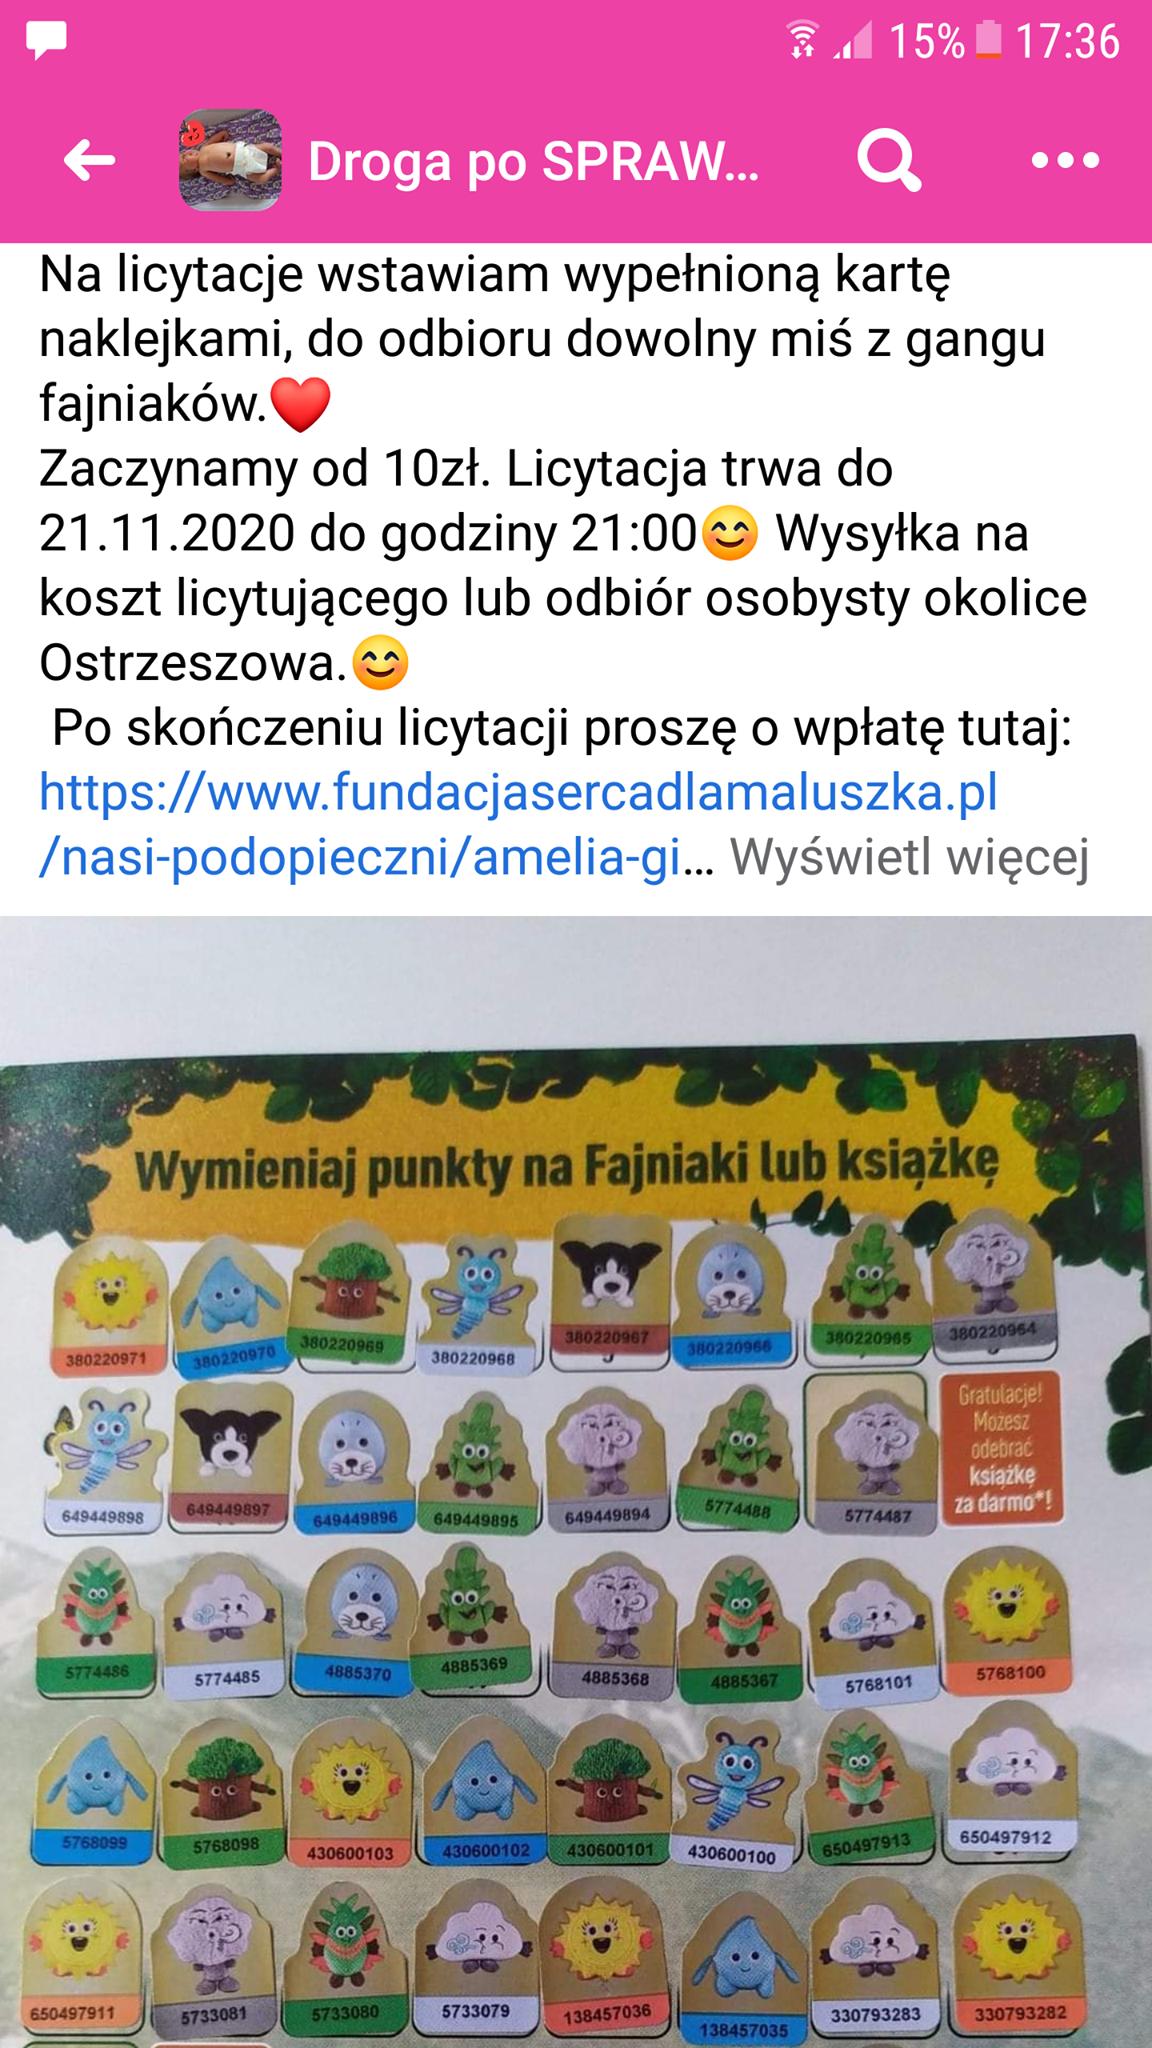 amelka9.png